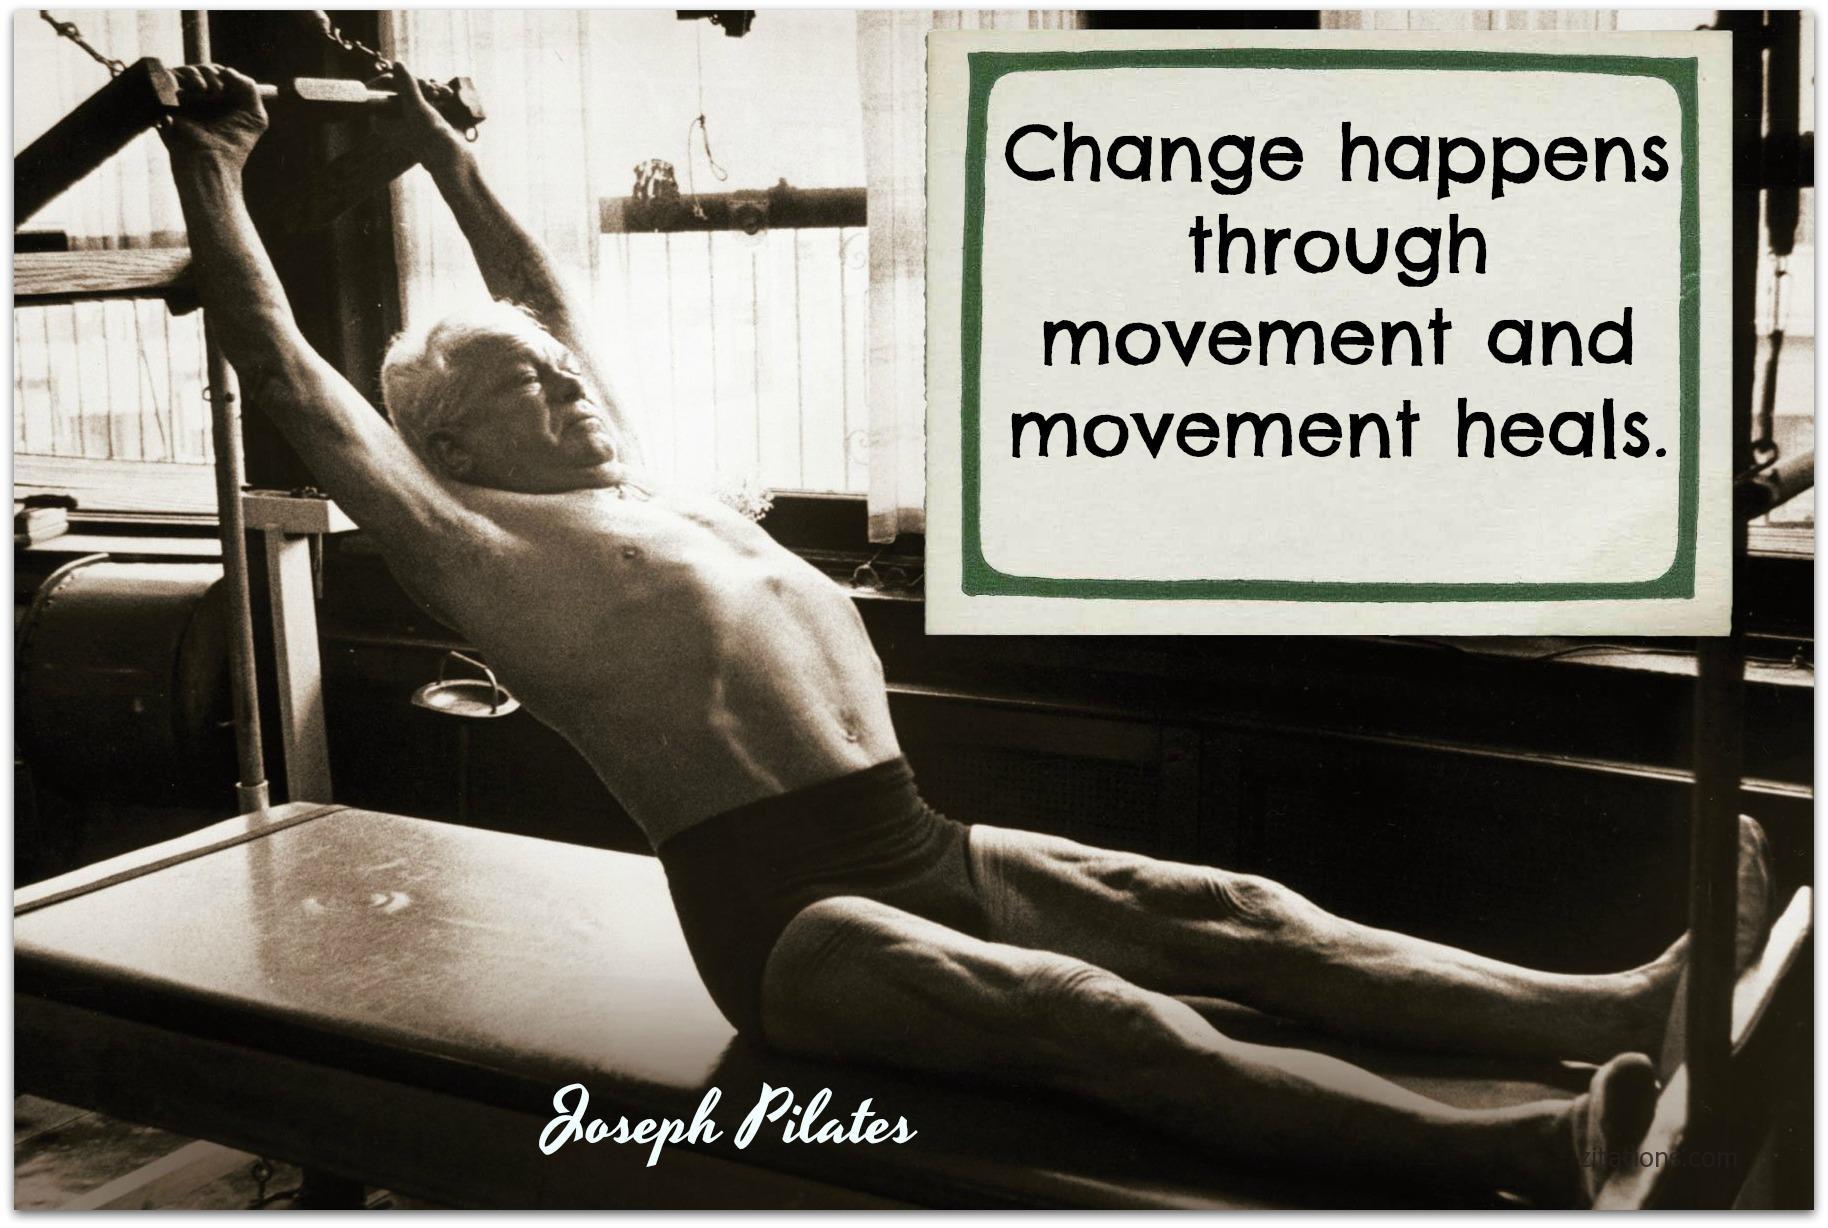 Joseph Pilates on exercises